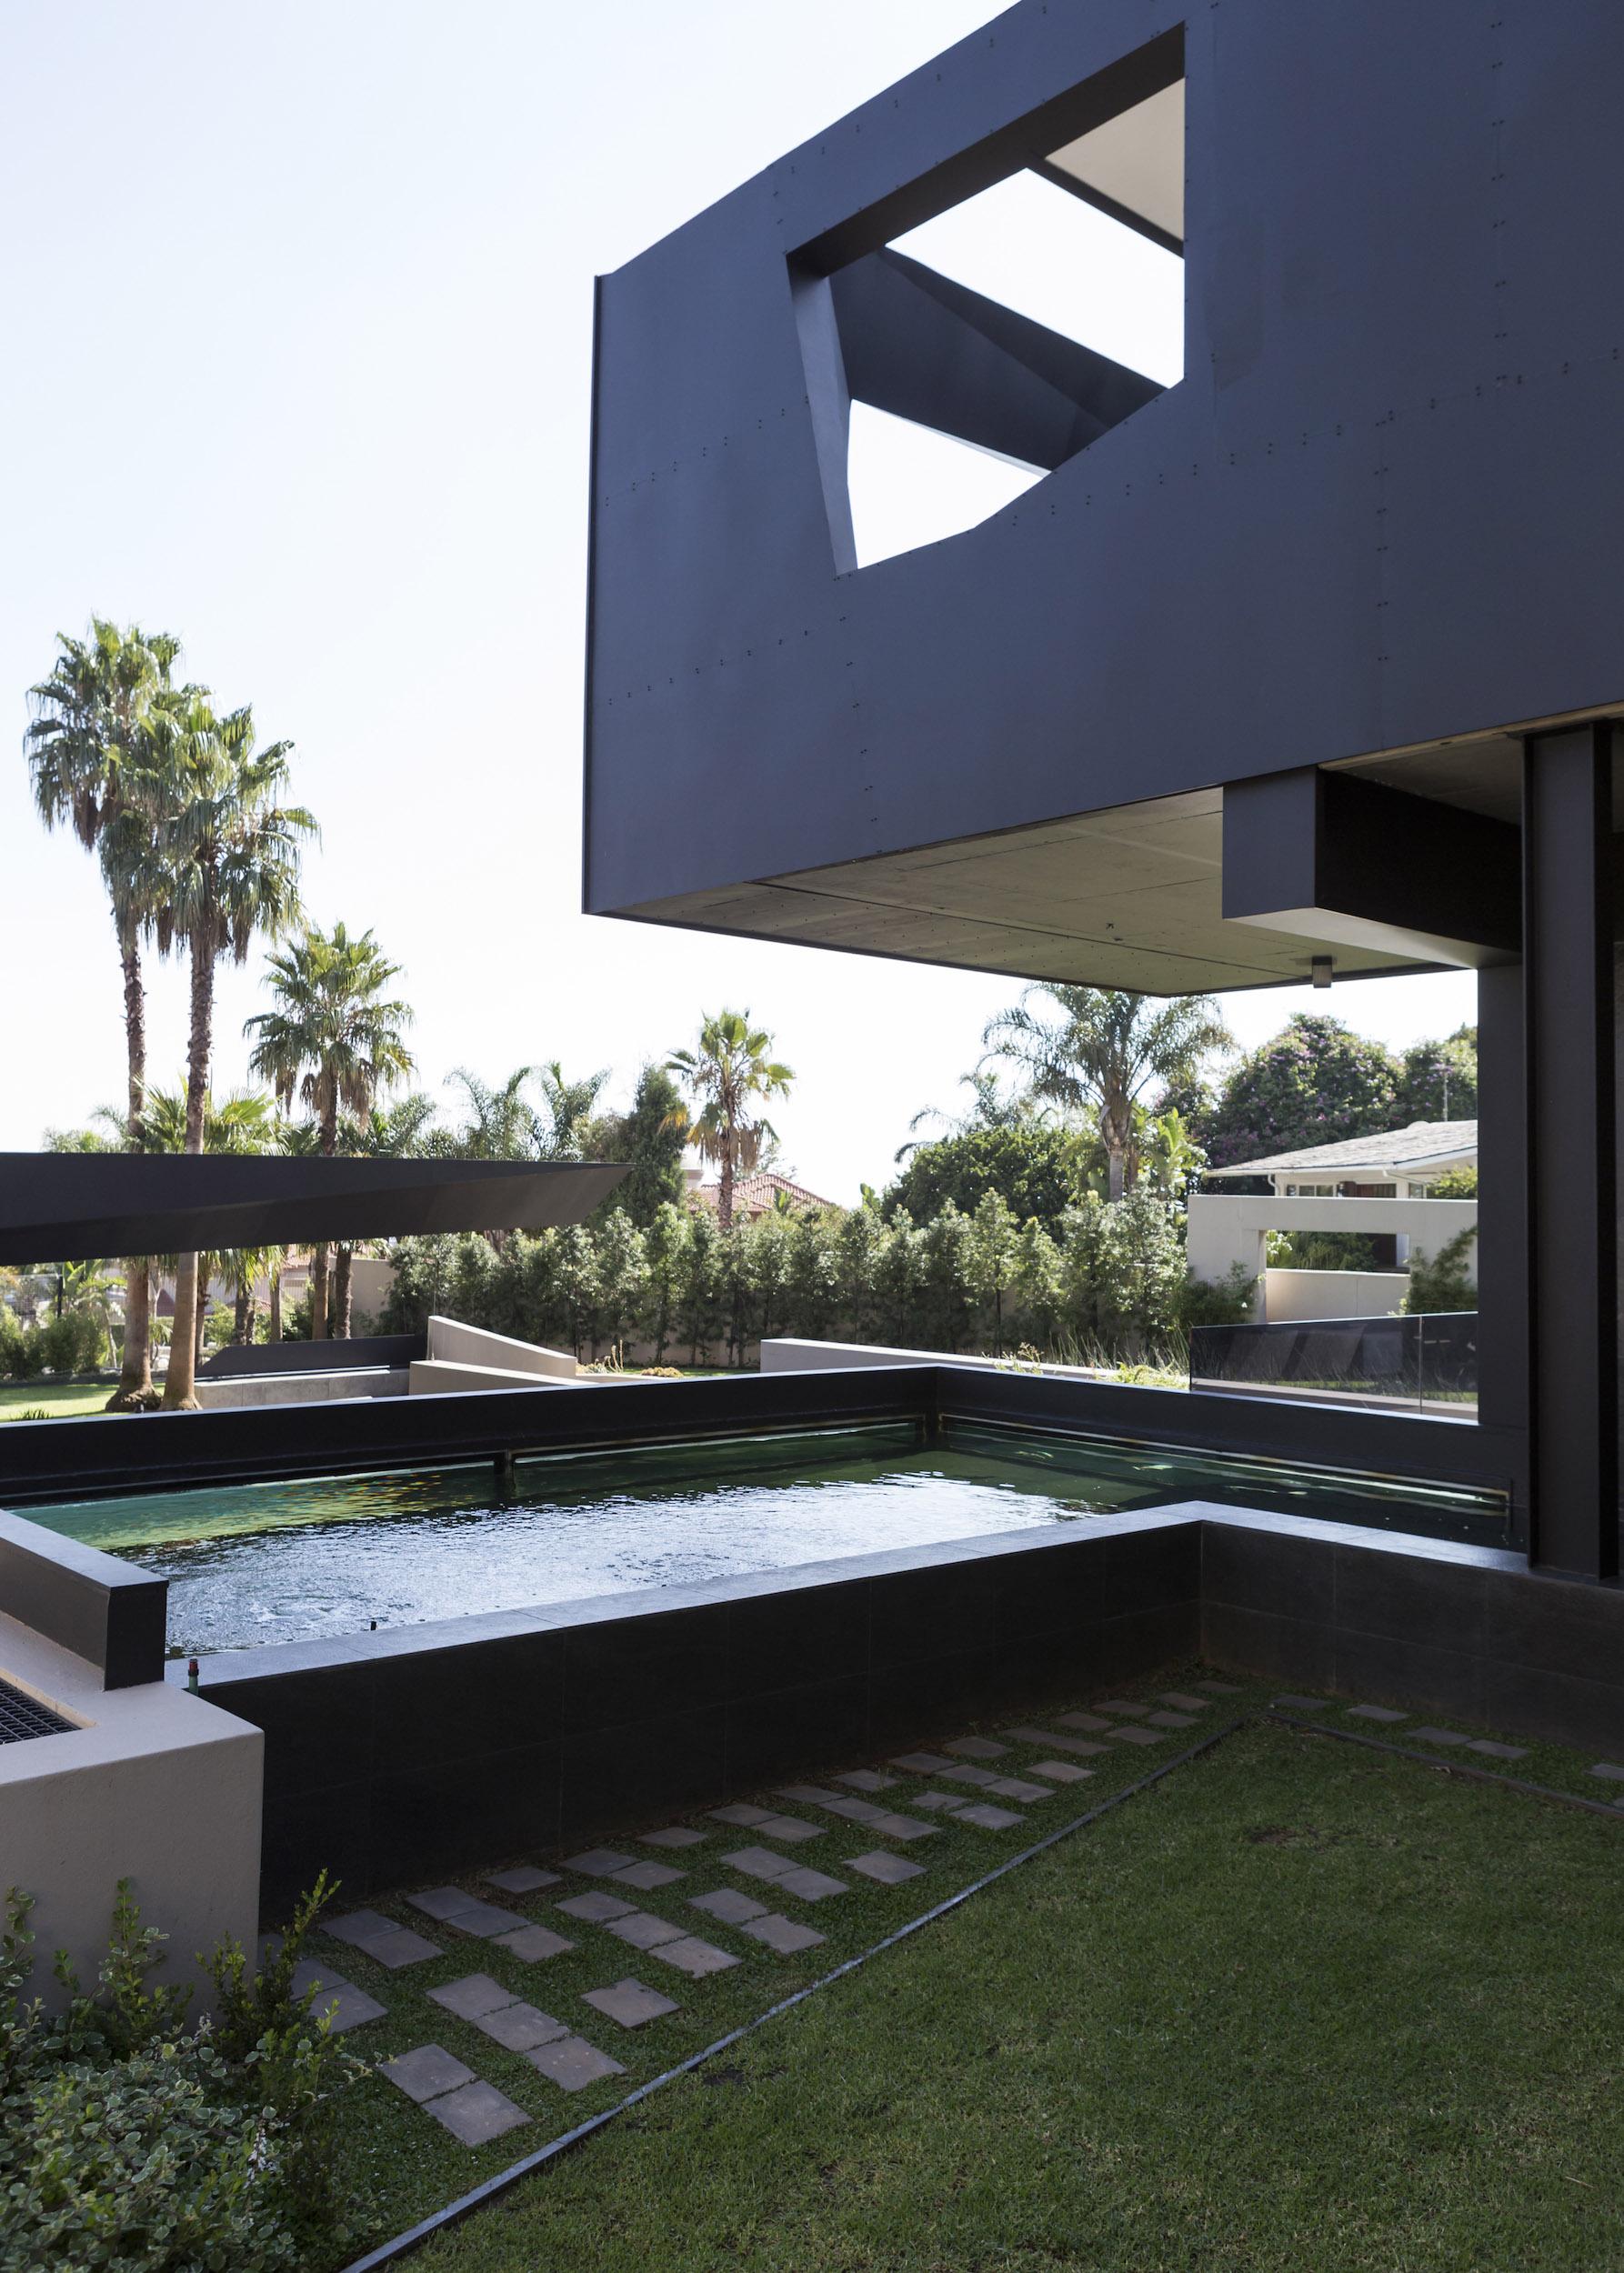 Kloof Road Masterpiece House in Johannesburg by Nico van der Meulen Architects-14